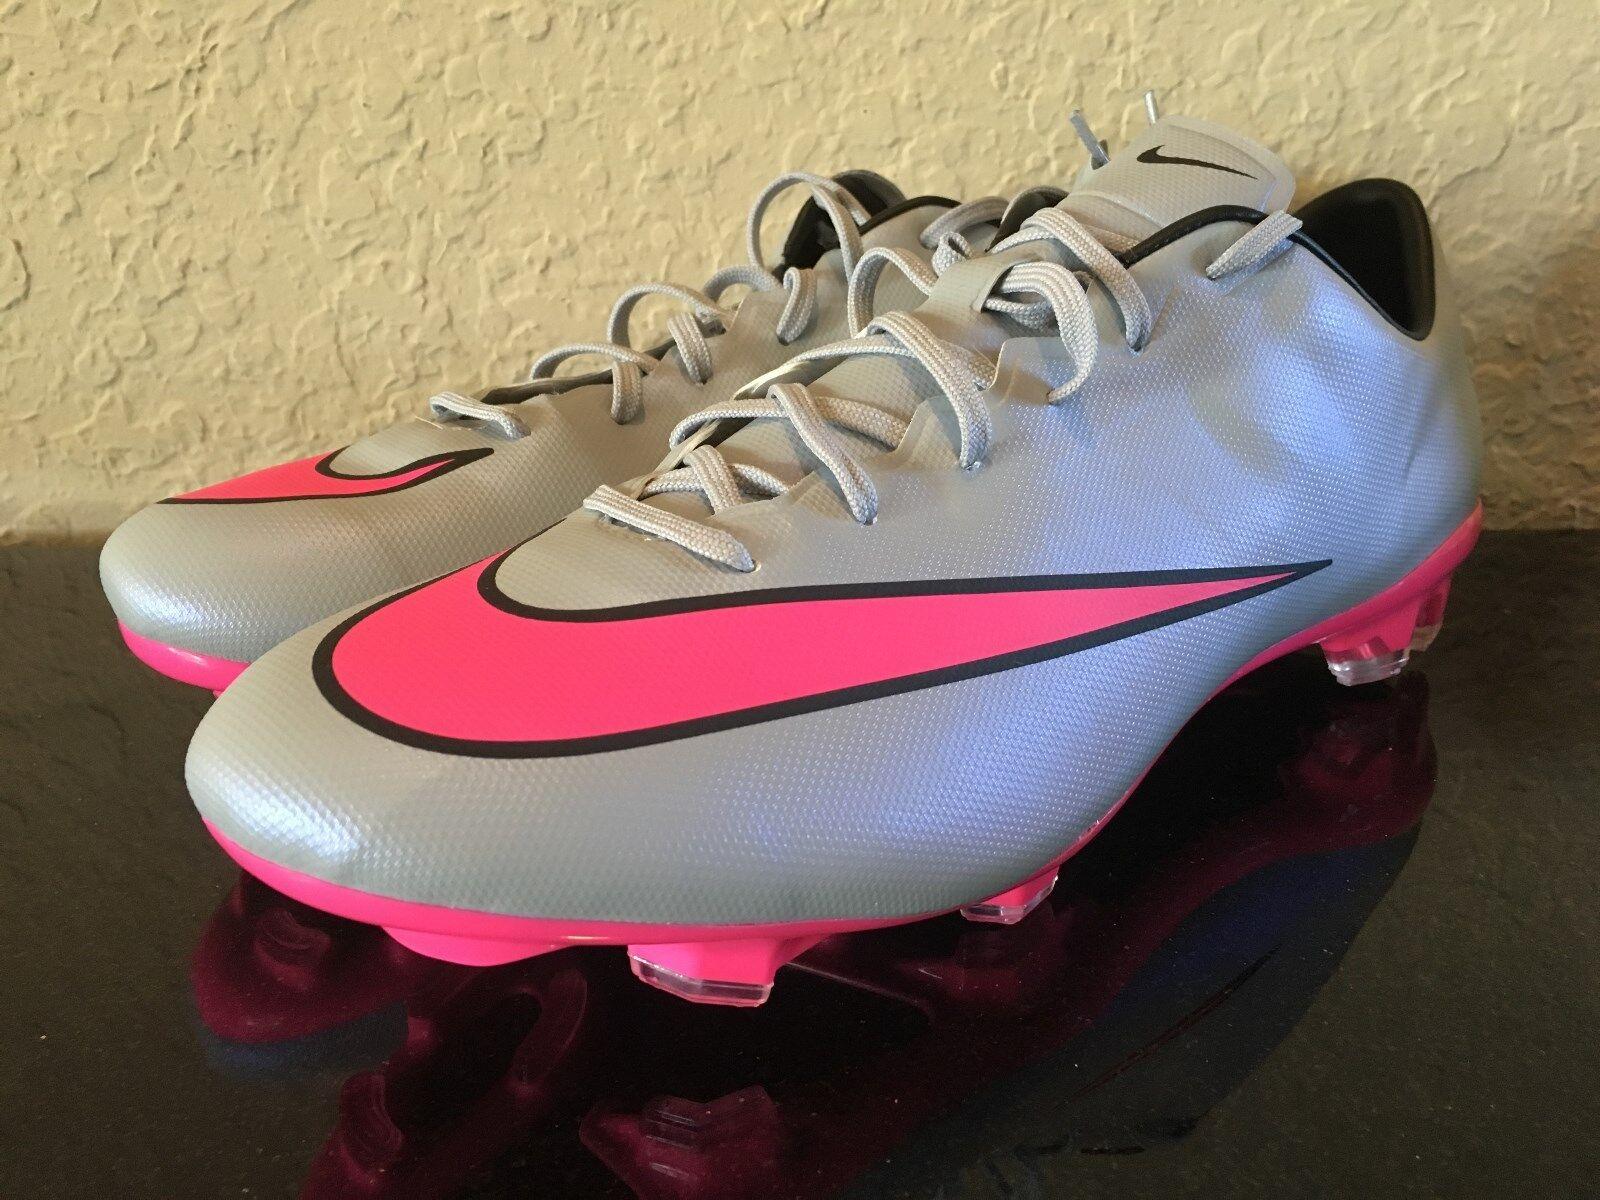 Nike Mercurial Veloce II 2 FG Soccer Cleat Grey Pink